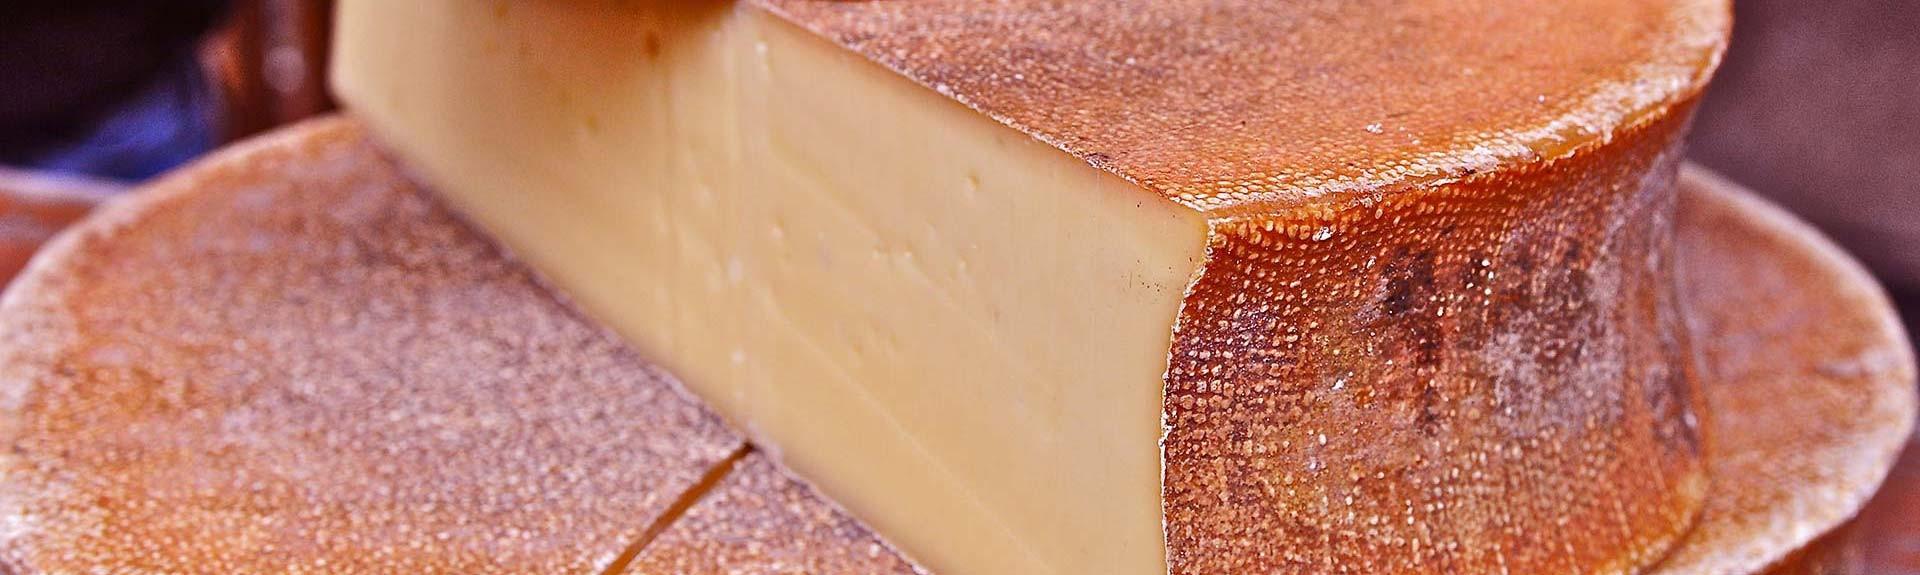 fromage-abondance-fabrication